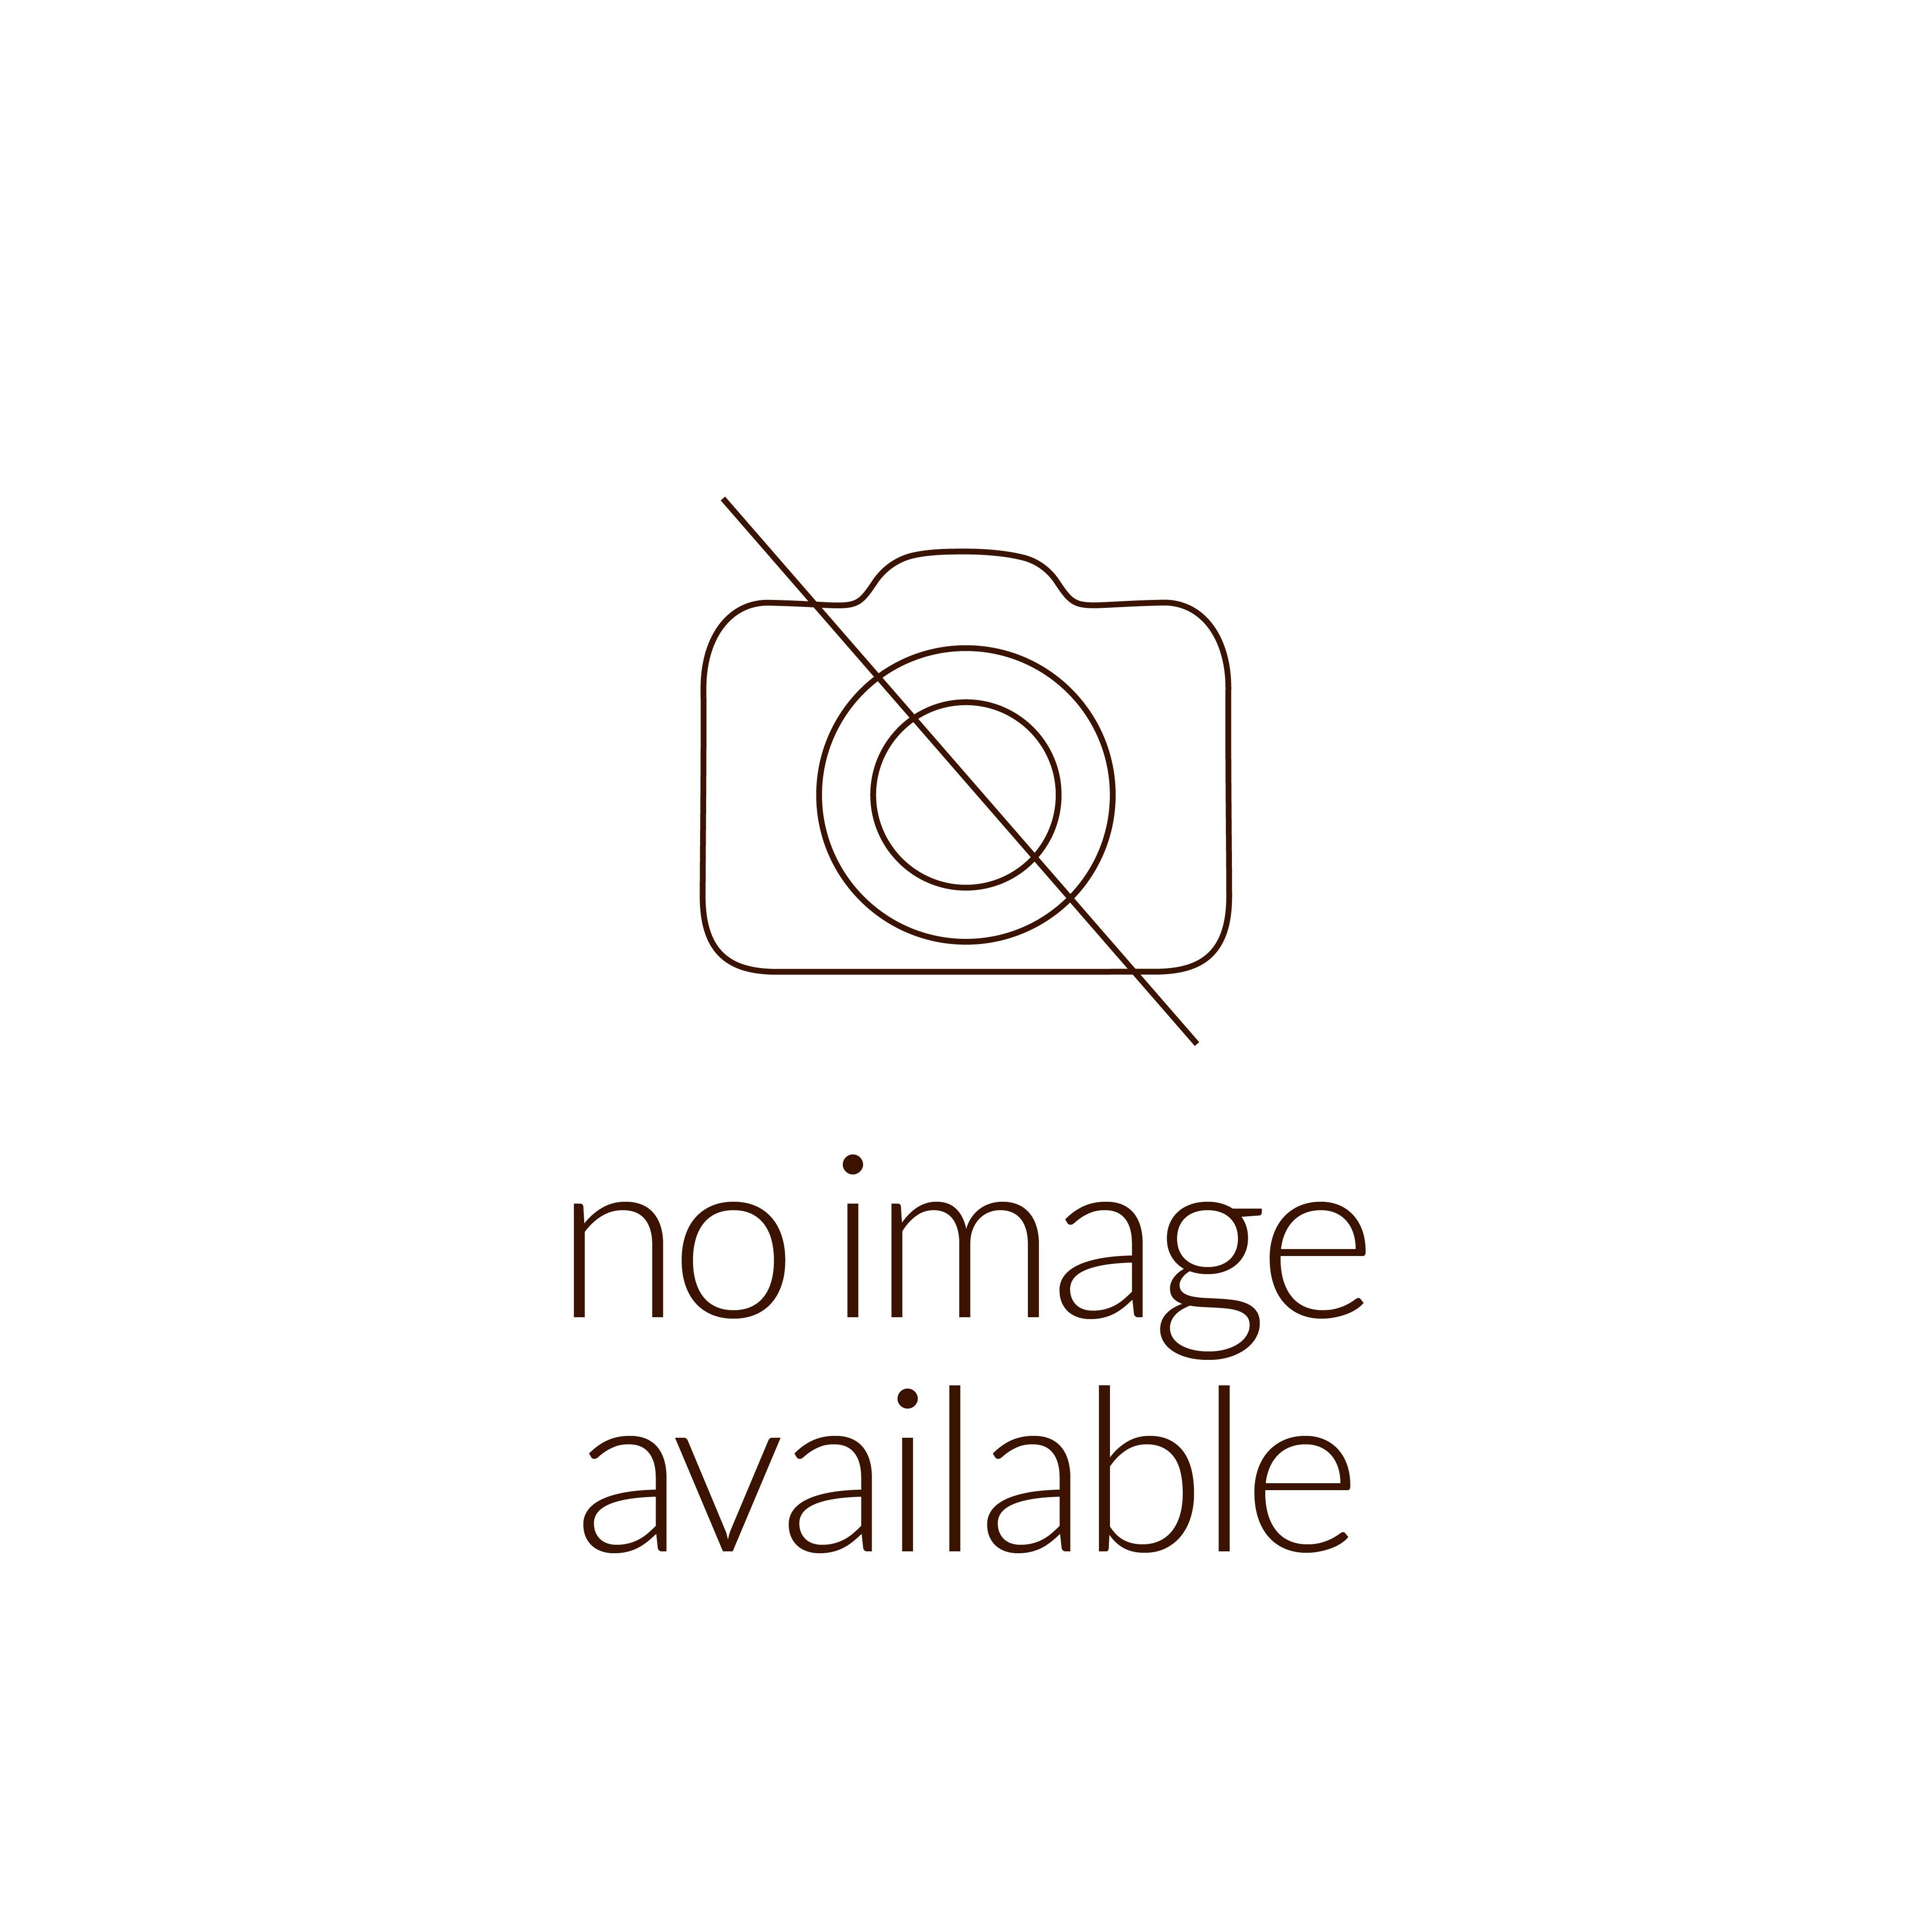 Teddy Kollek - 70.0 mm, 140 g, Bronze Tombac Medal